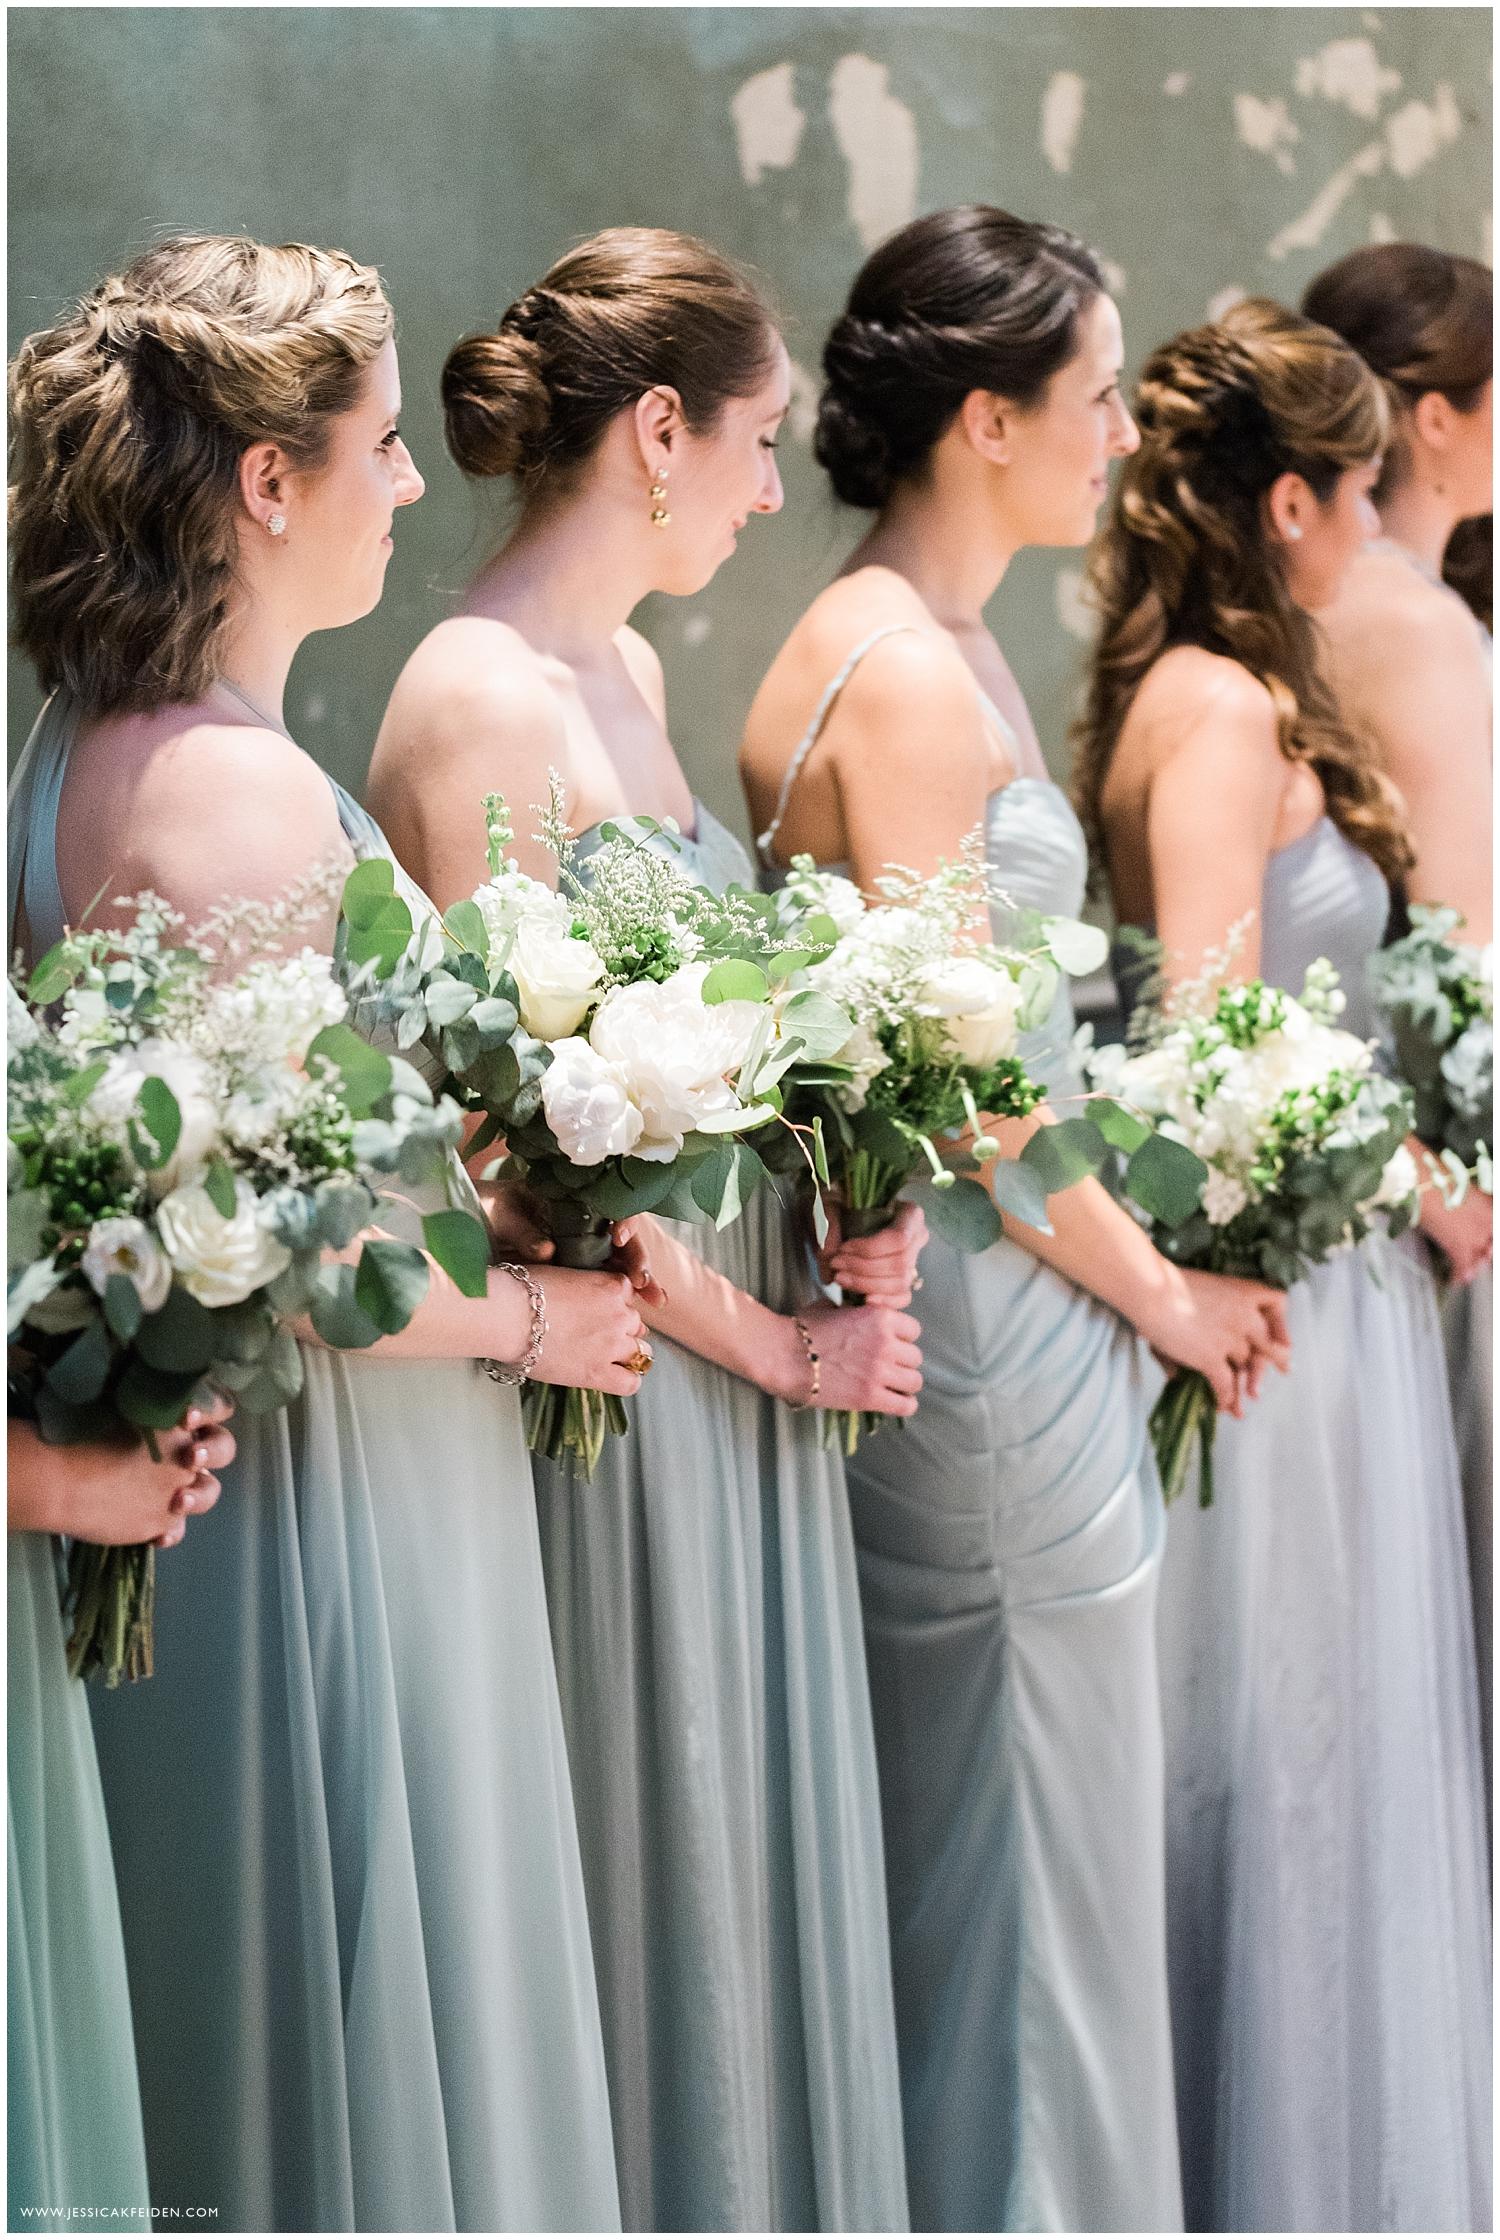 Jessica K Feiden Photography_Margaux+Tim's Irondale Center Brooklyn Wedding_0027.jpg